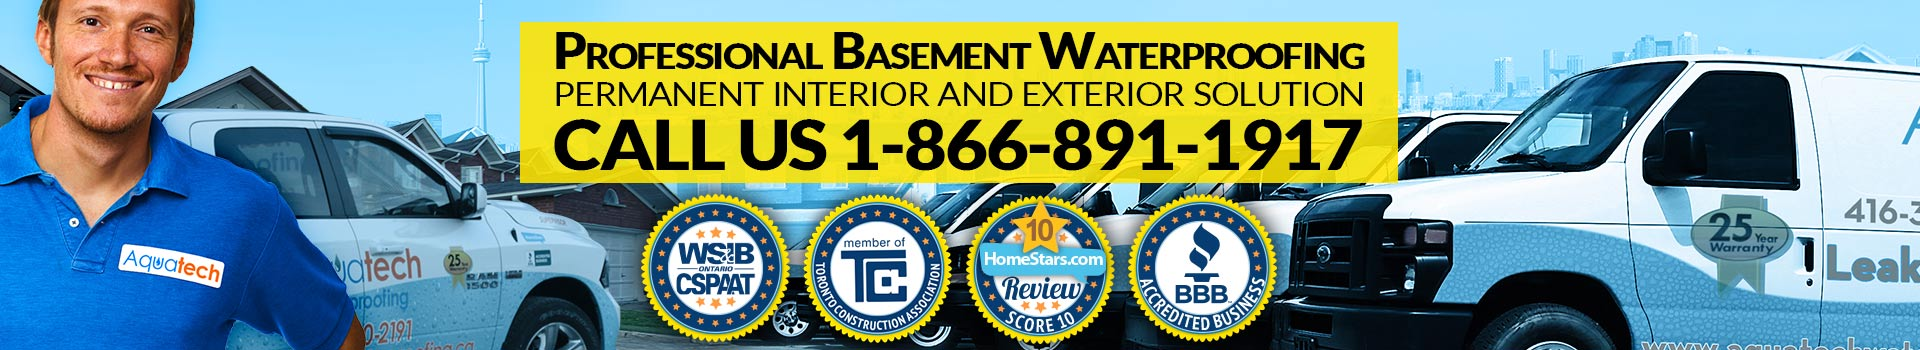 aquatech professional basement waterproofing banner